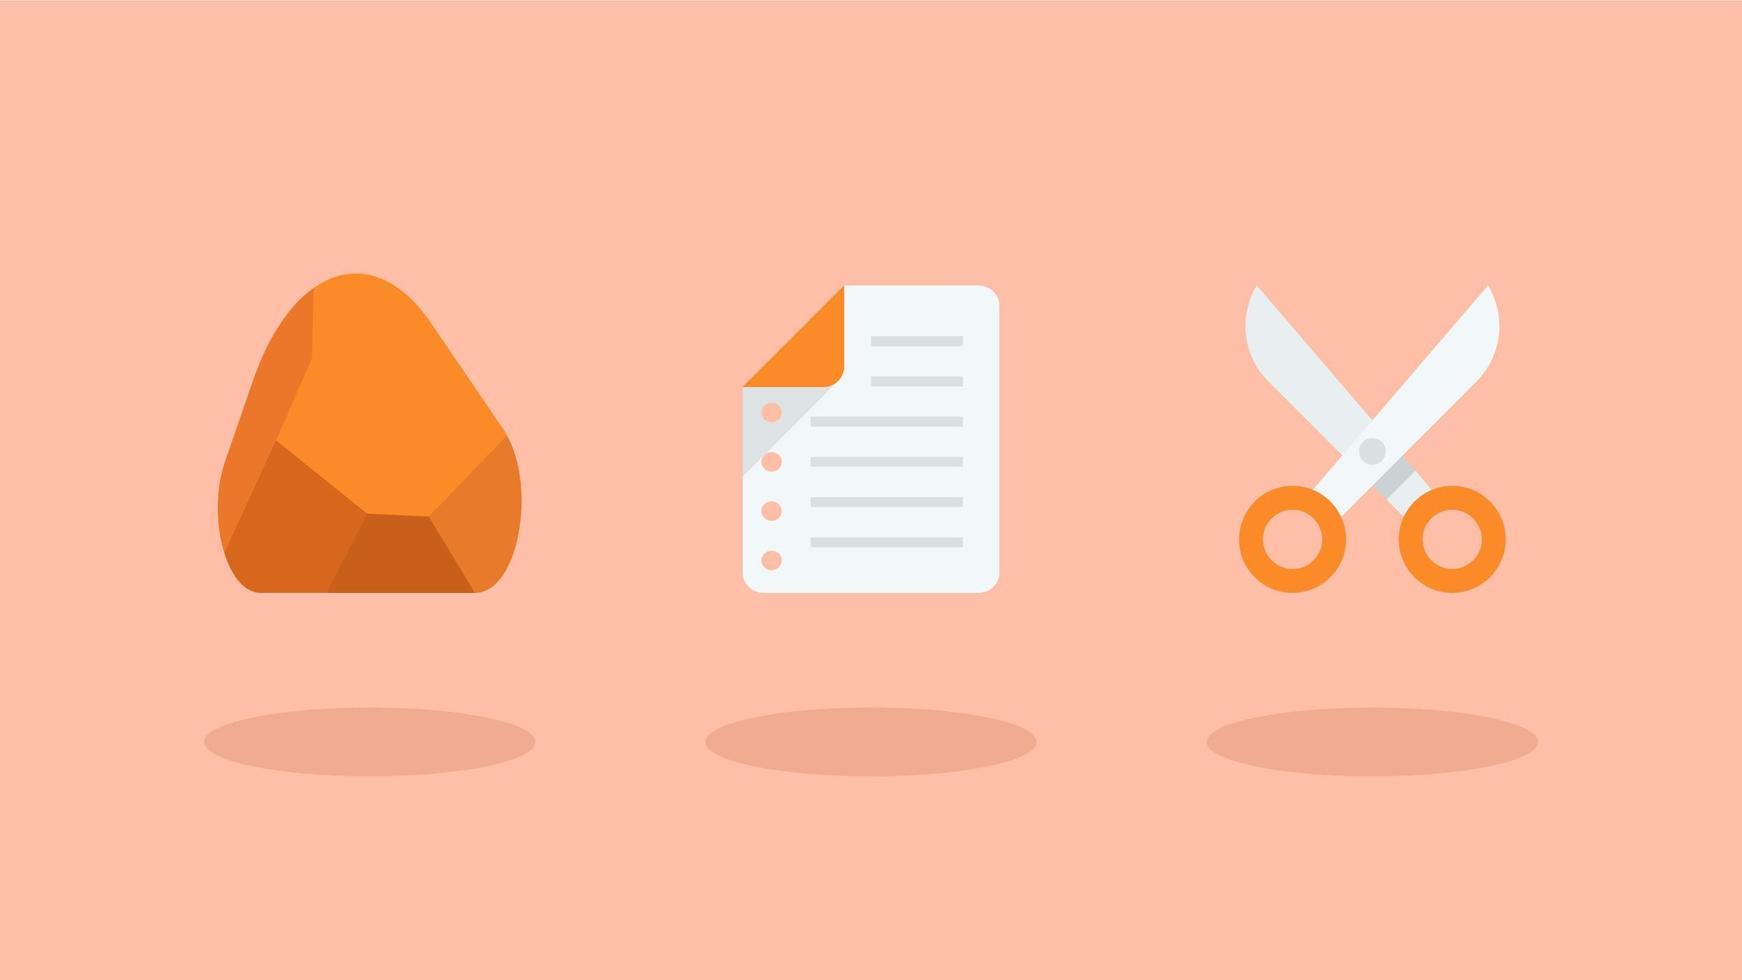 rock paper scissors flat icons vetor